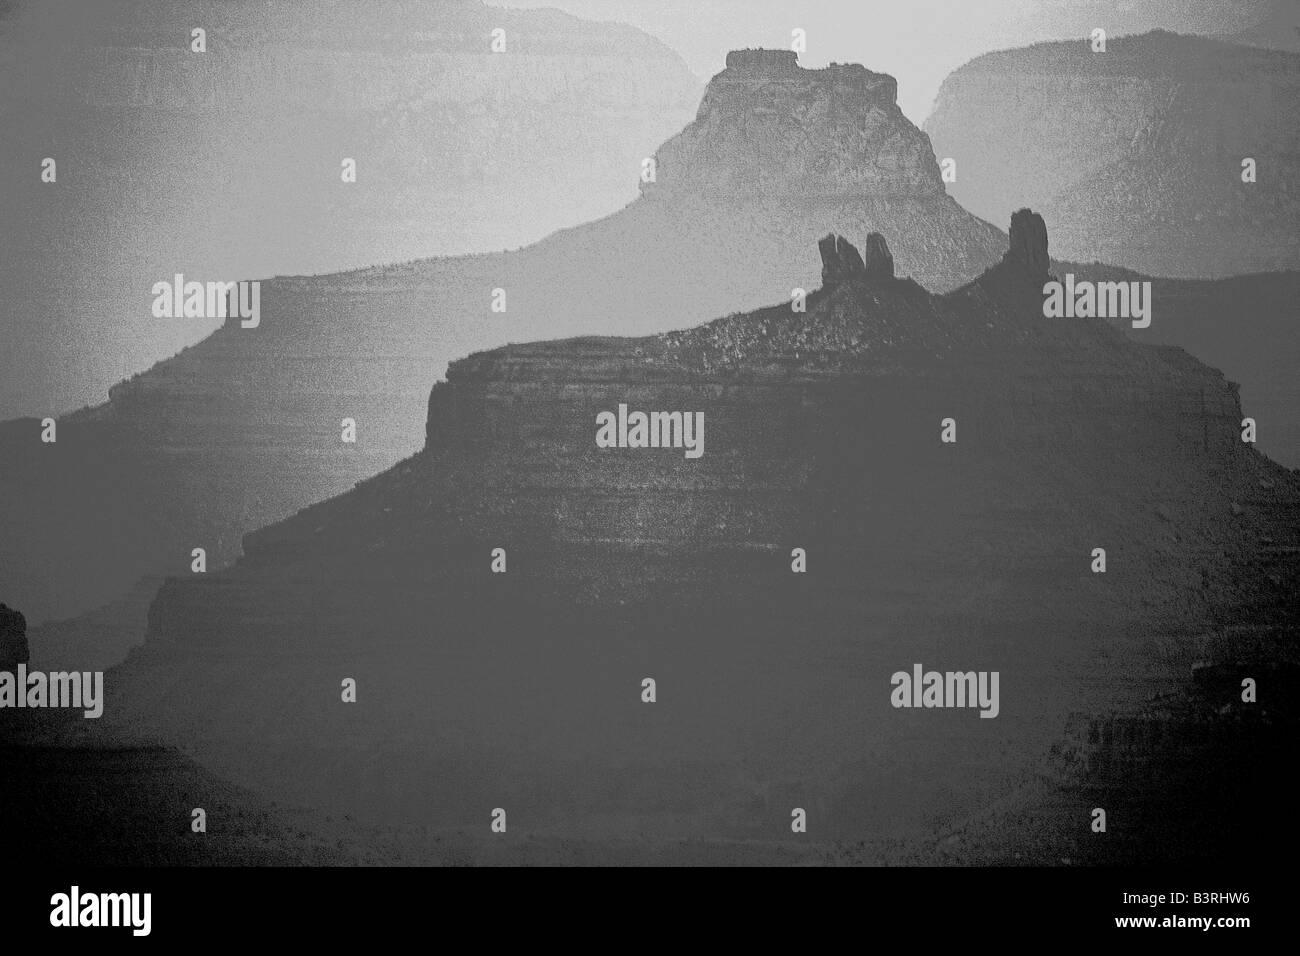 Grand Canyon National Park - Arizona - After sunset - Arizona USA - Digitally manipulated Stock Photo